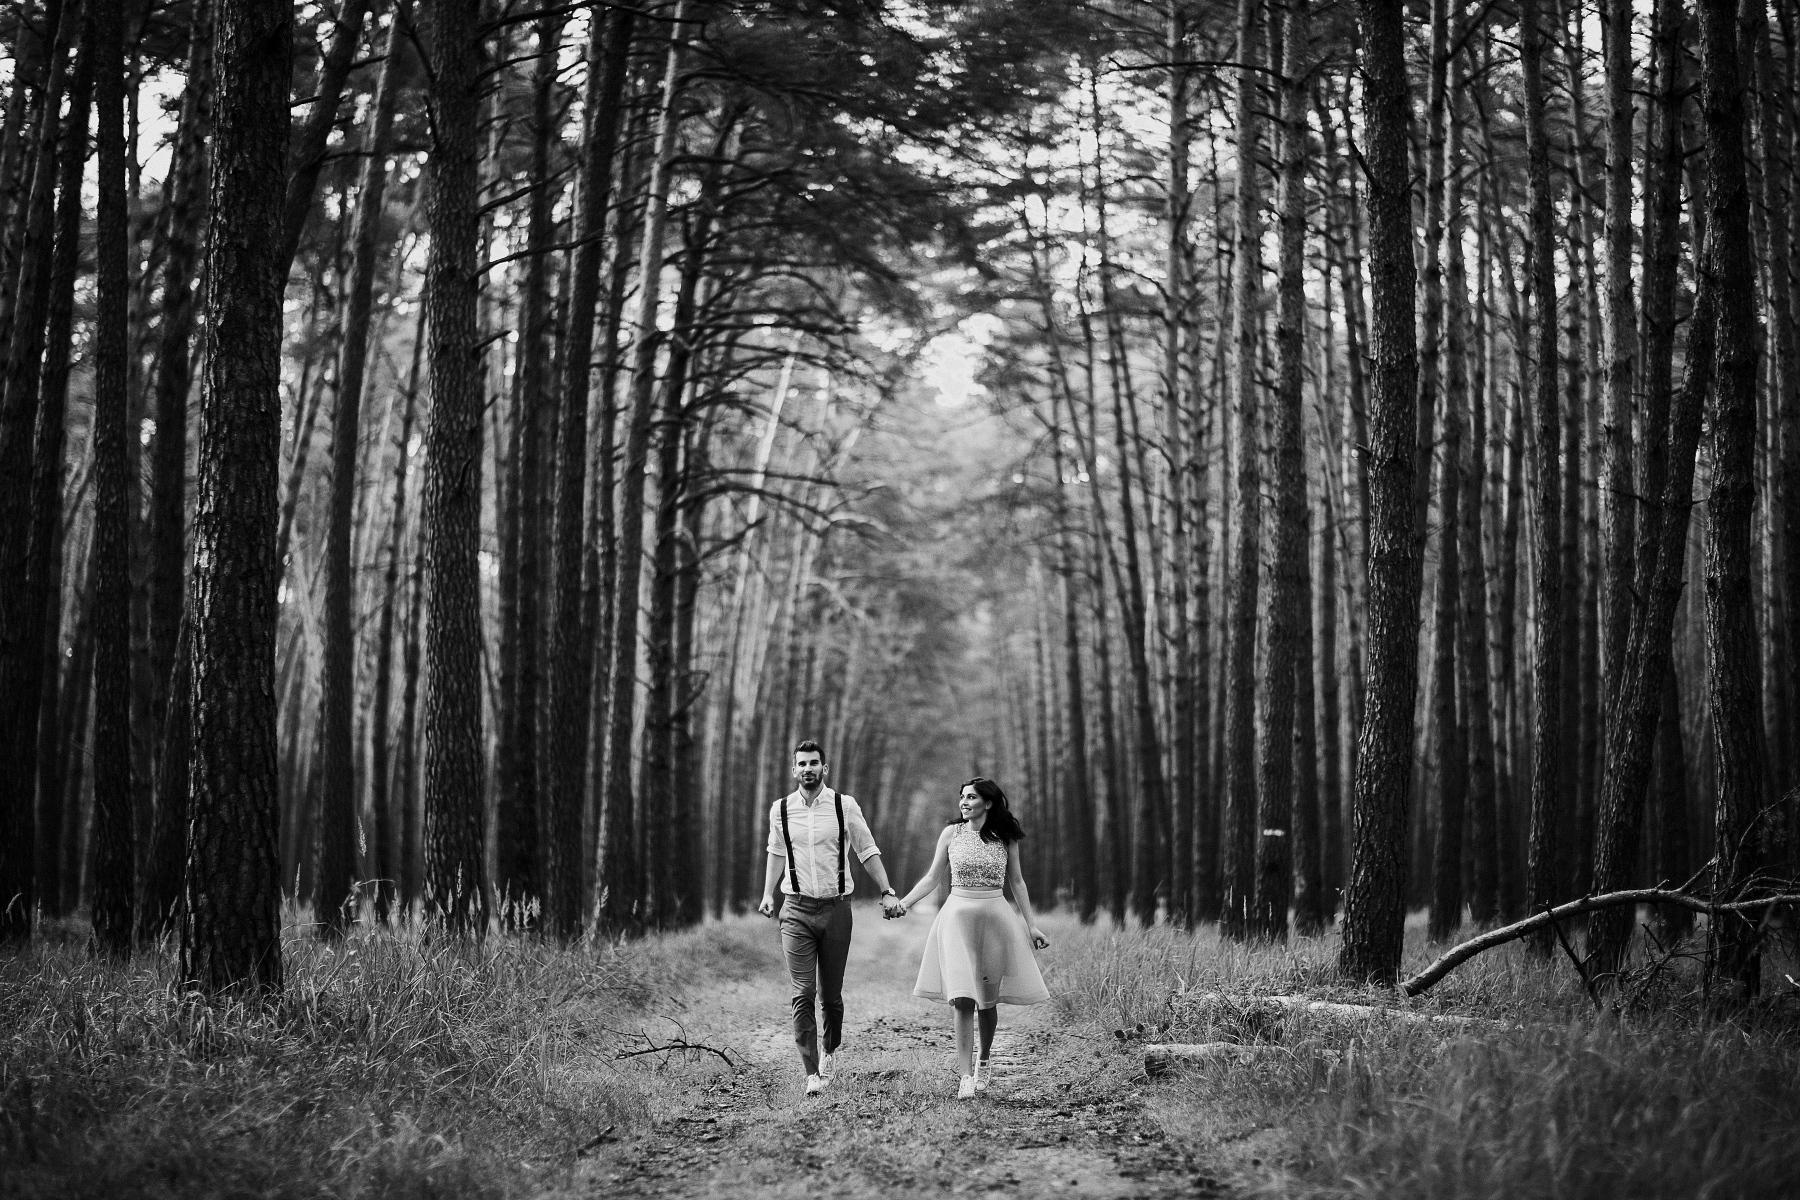 neco modra, svdba v modre, neco estate winery Modra,#fotograf-Slovensko, #vychod, #LubosKrahulec, #tatry, #SlovenskyRaj, #svadobnefotenie, #AsociáciaSlovenskychSvadobnychFotografov, #fotograftatry, #fotenieVrieke, #svadba-v-prirode,